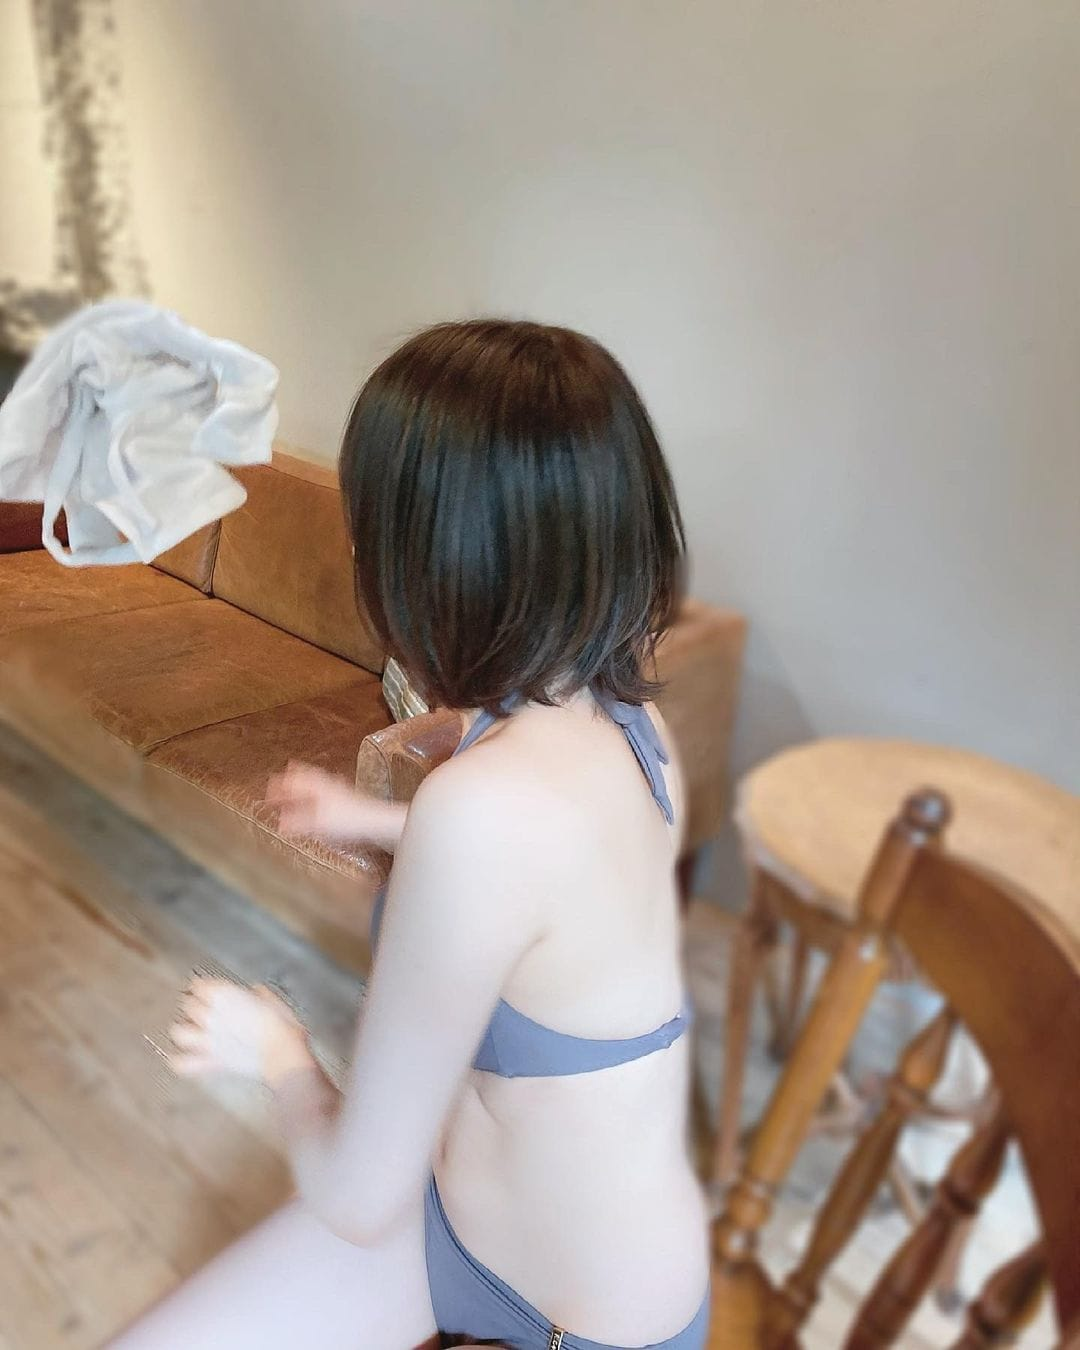 NMB48水田詩織「ビキニスタイルで美バストちらり」雑誌撮影のオフショットにファン歓喜【画像3枚】の画像003